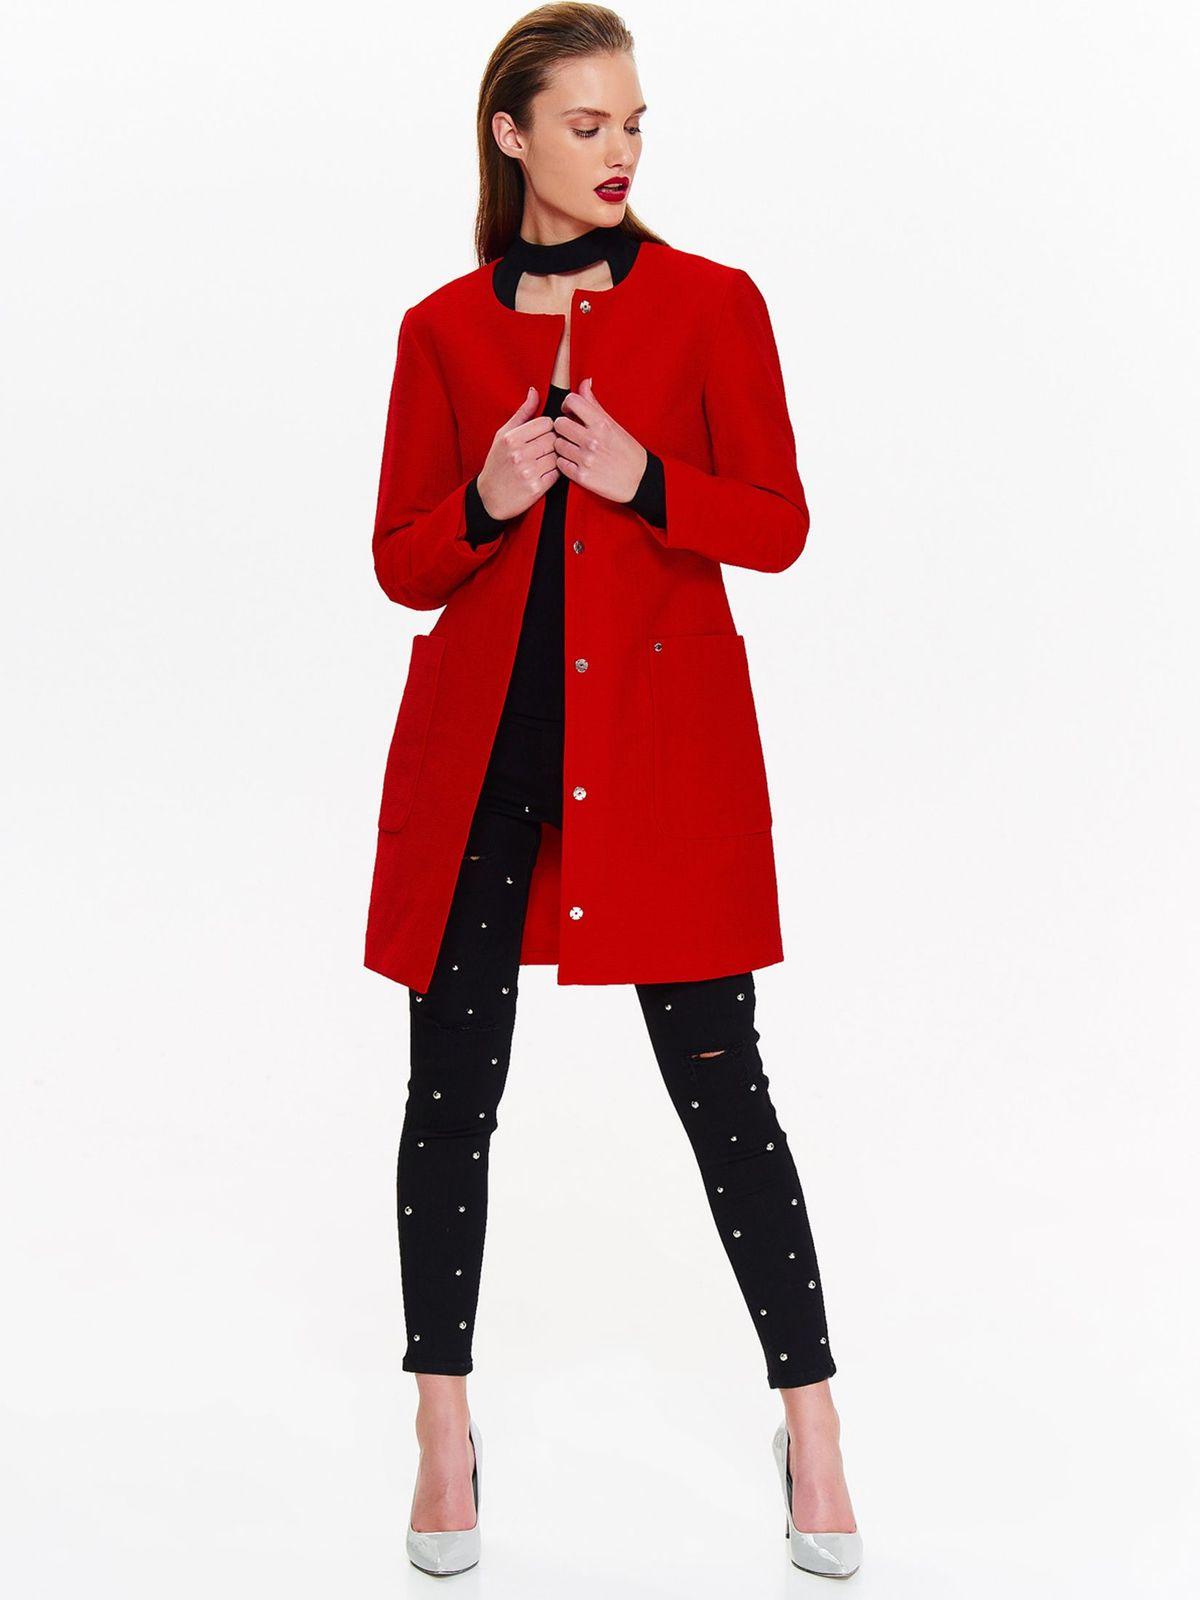 TOP SECRET top secret ανοιξιατικο παλτο